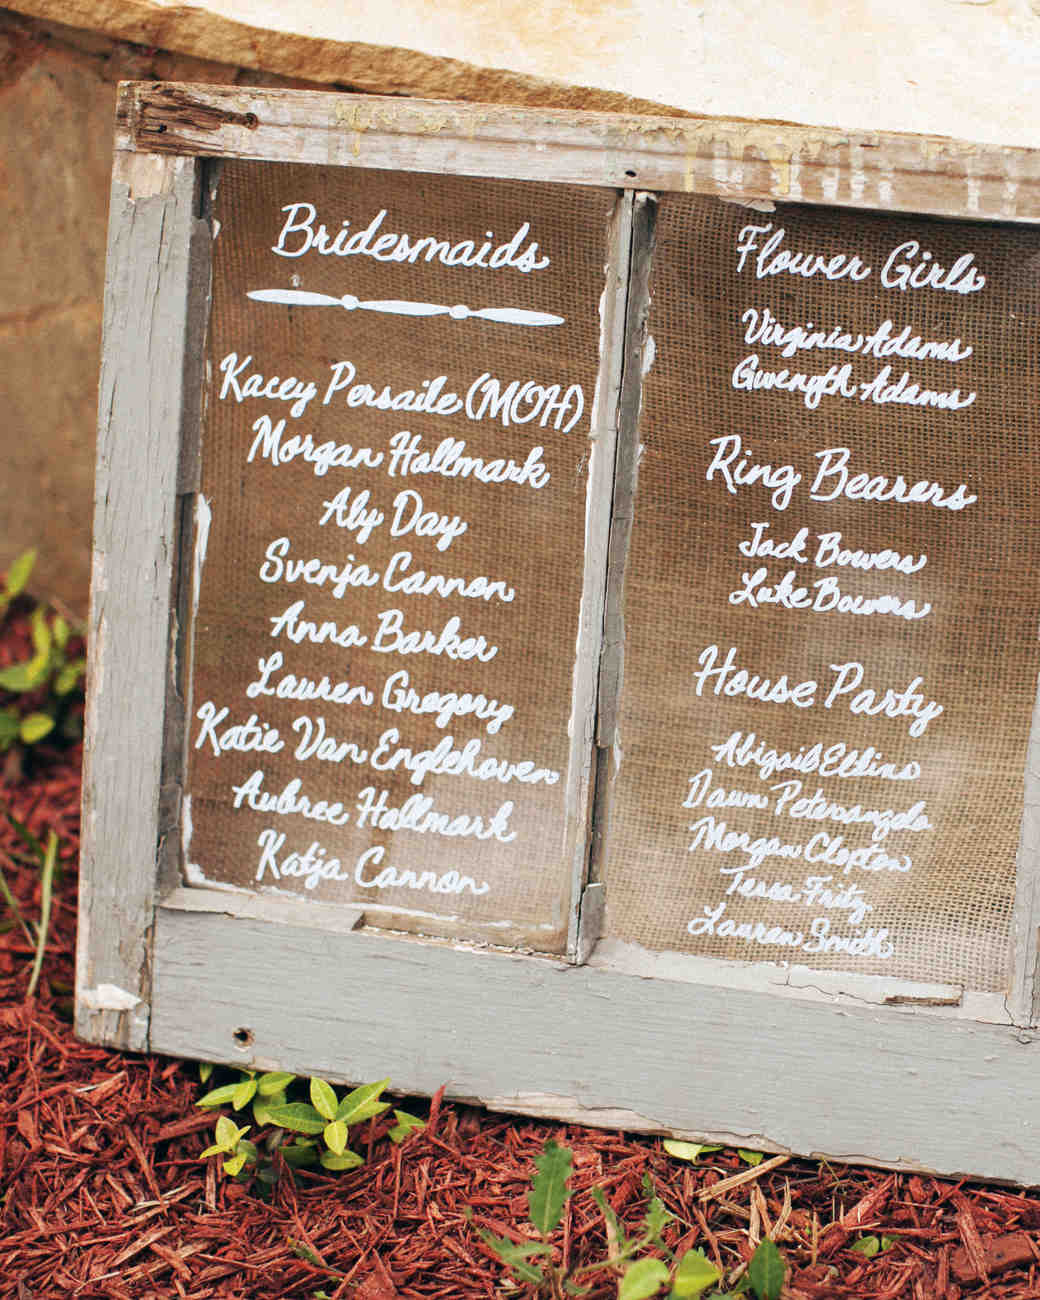 rustic-wedding-handbook-flea-market-tips-window-screen-0814.jpg